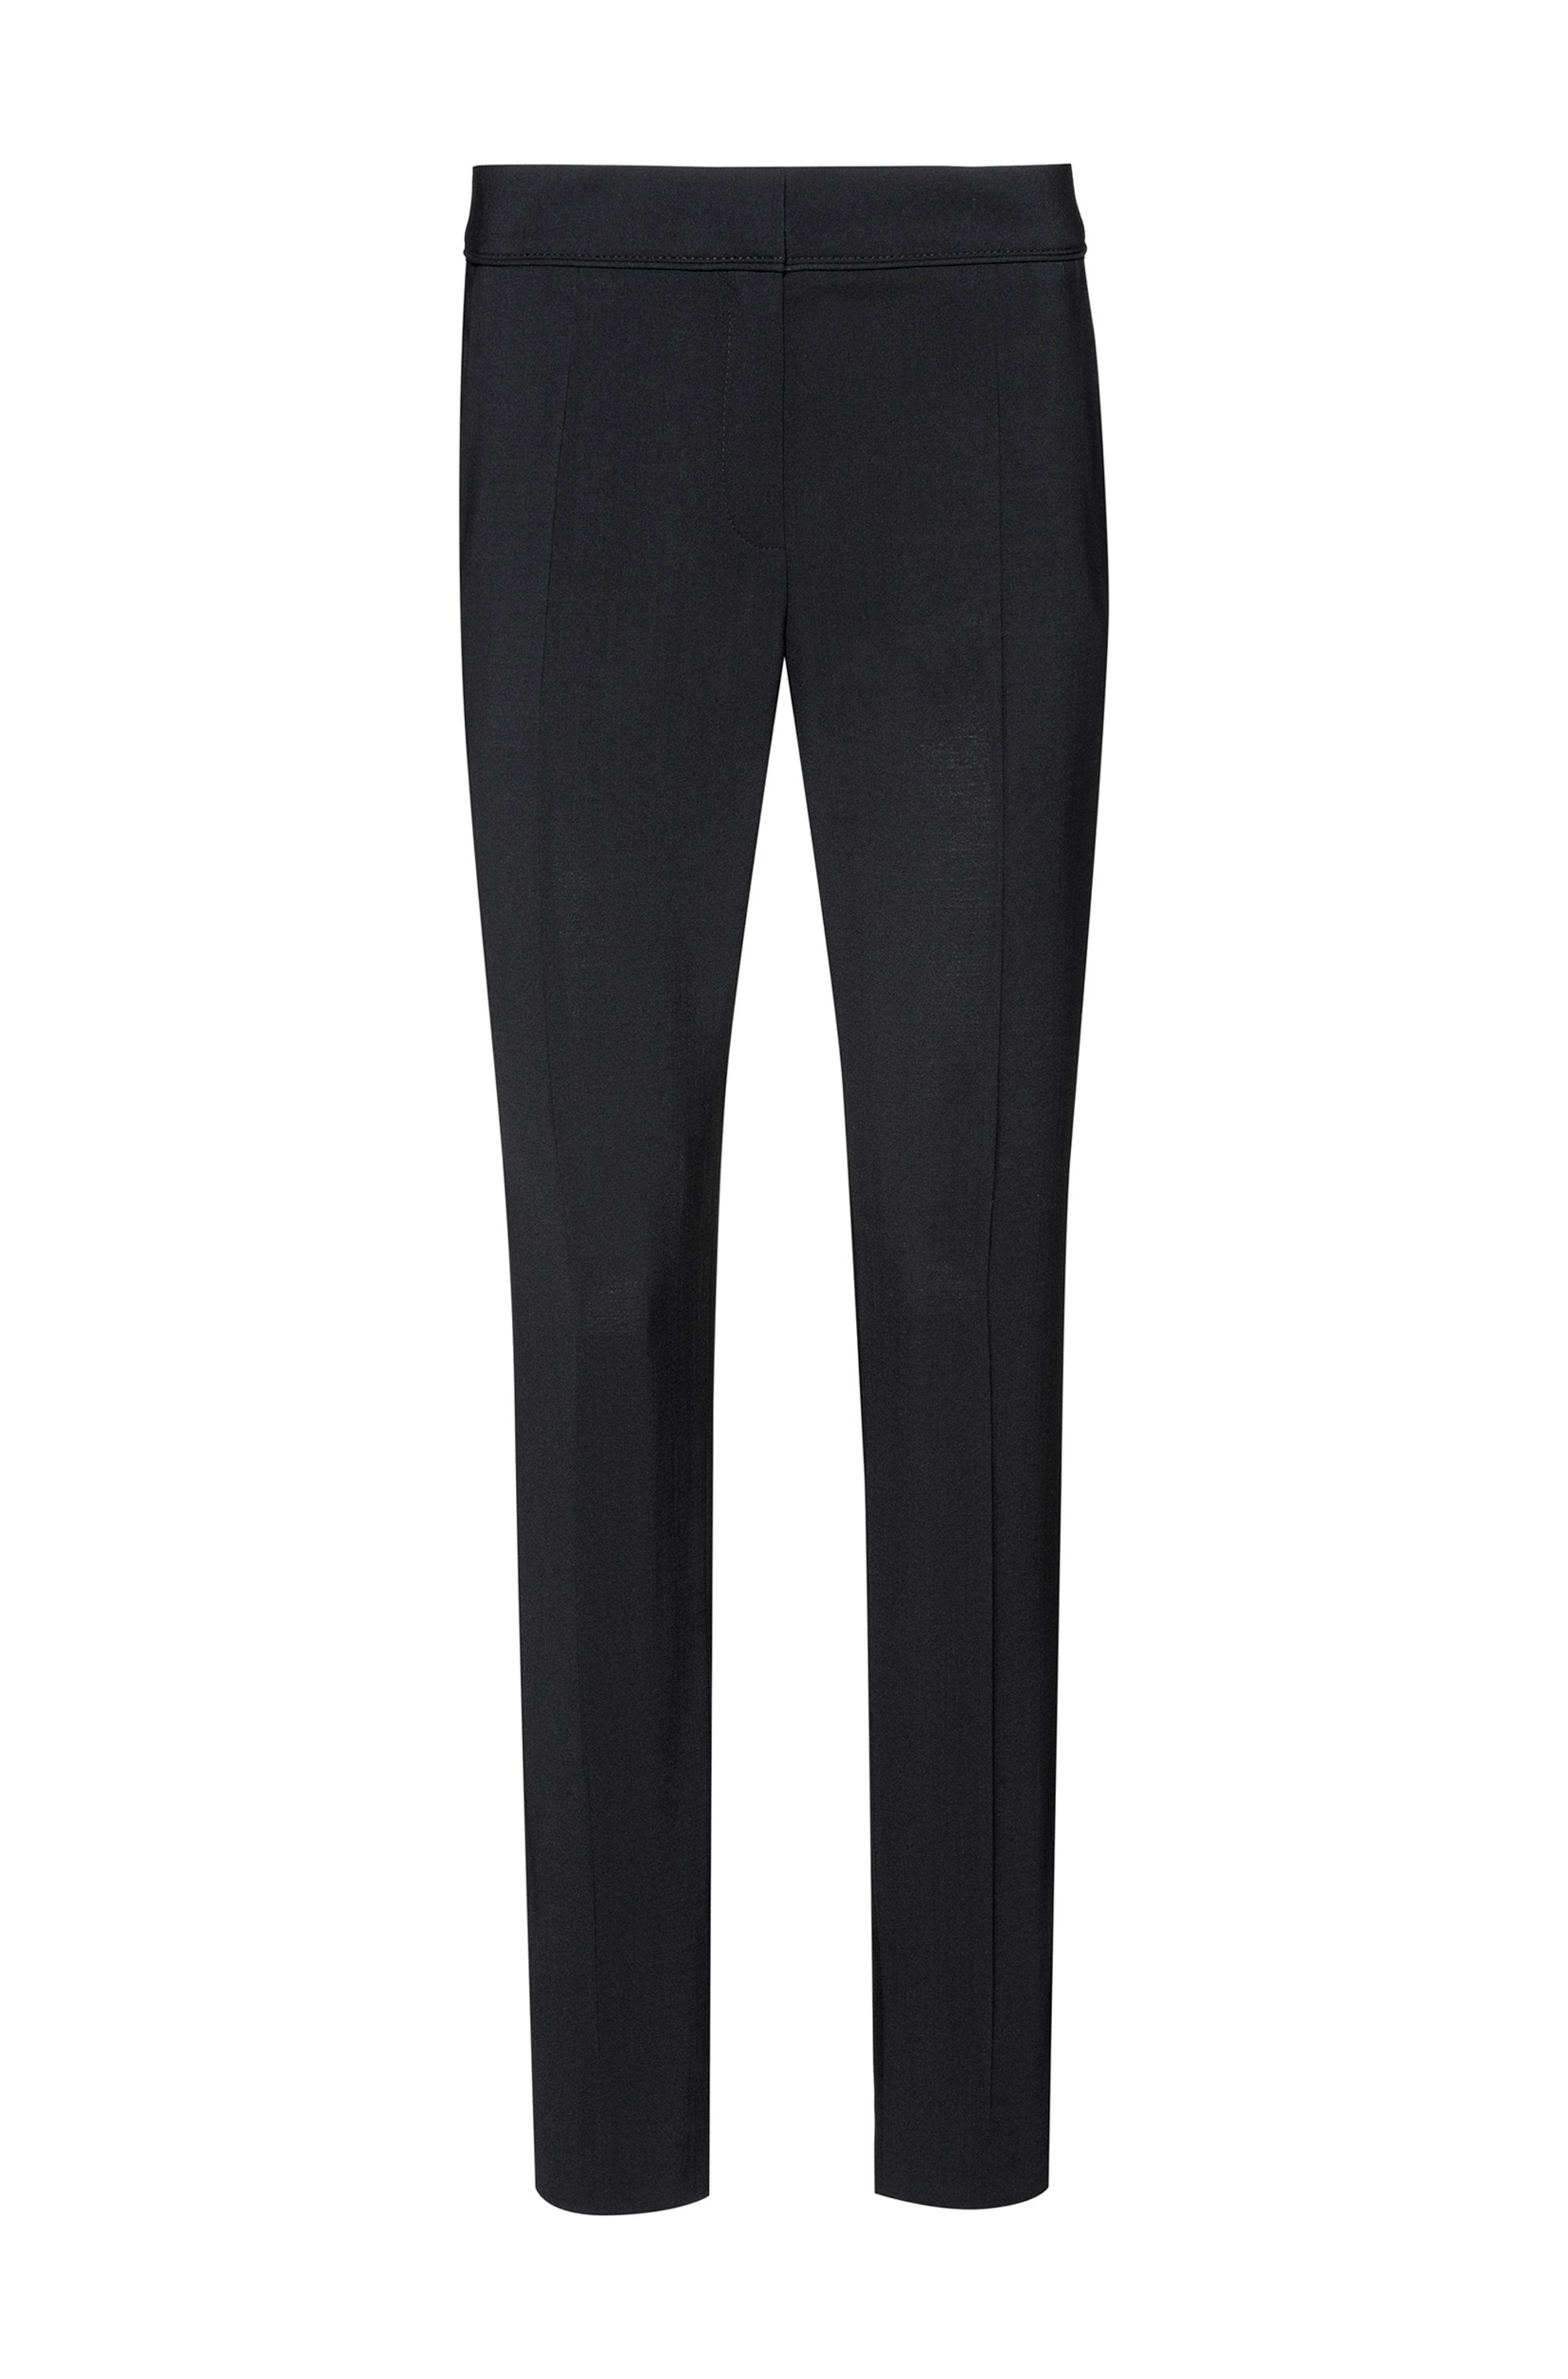 Pantalones regular fit tobilleros en lana virgen elástica, Negro